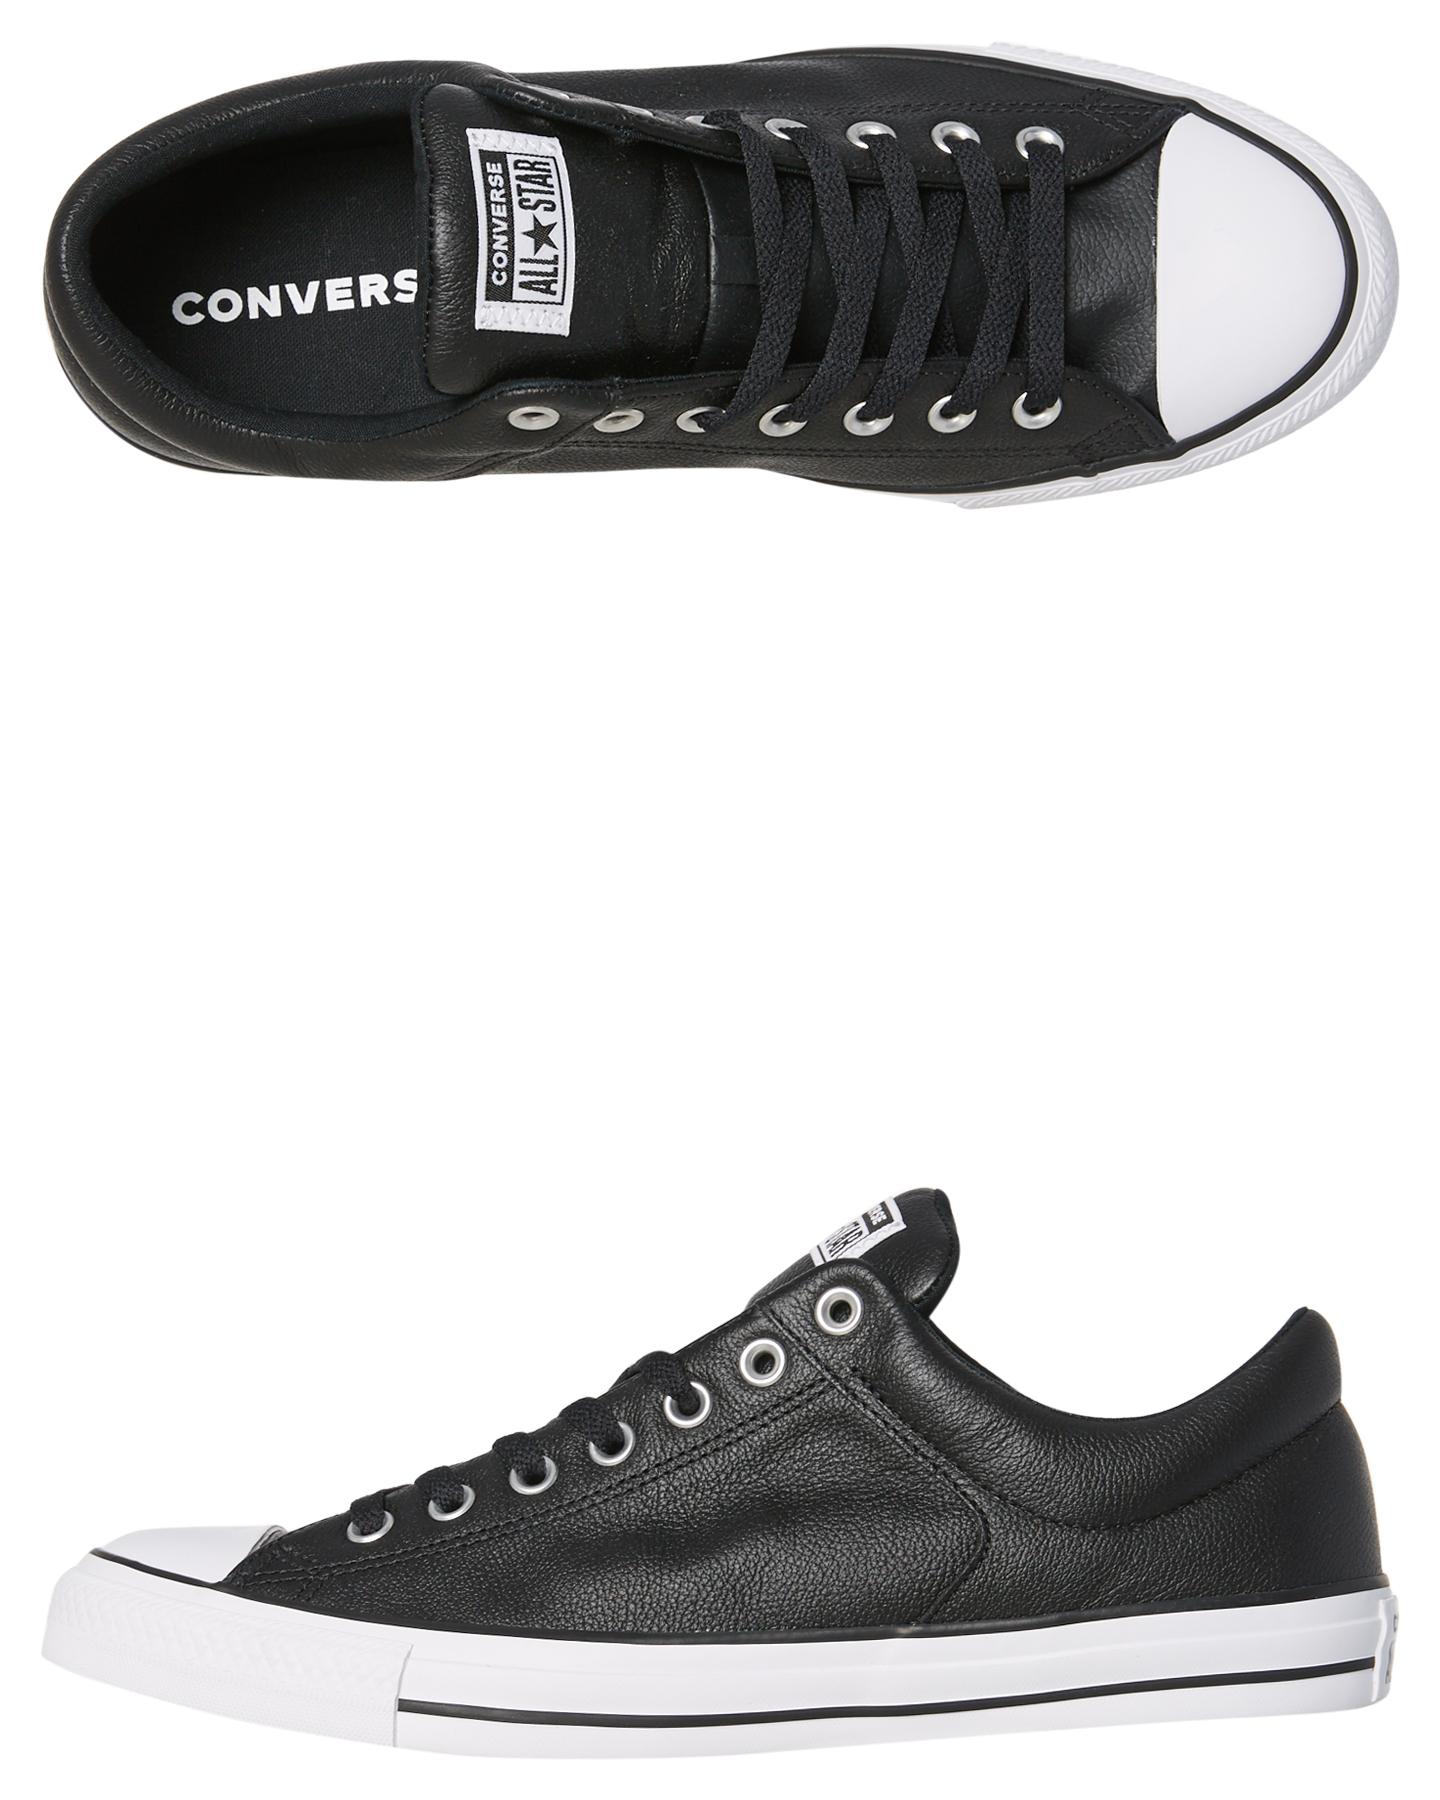 4e9603beba7c Converse Mens Chuck Taylor All Star Street Leather Shoe Black Womens ...